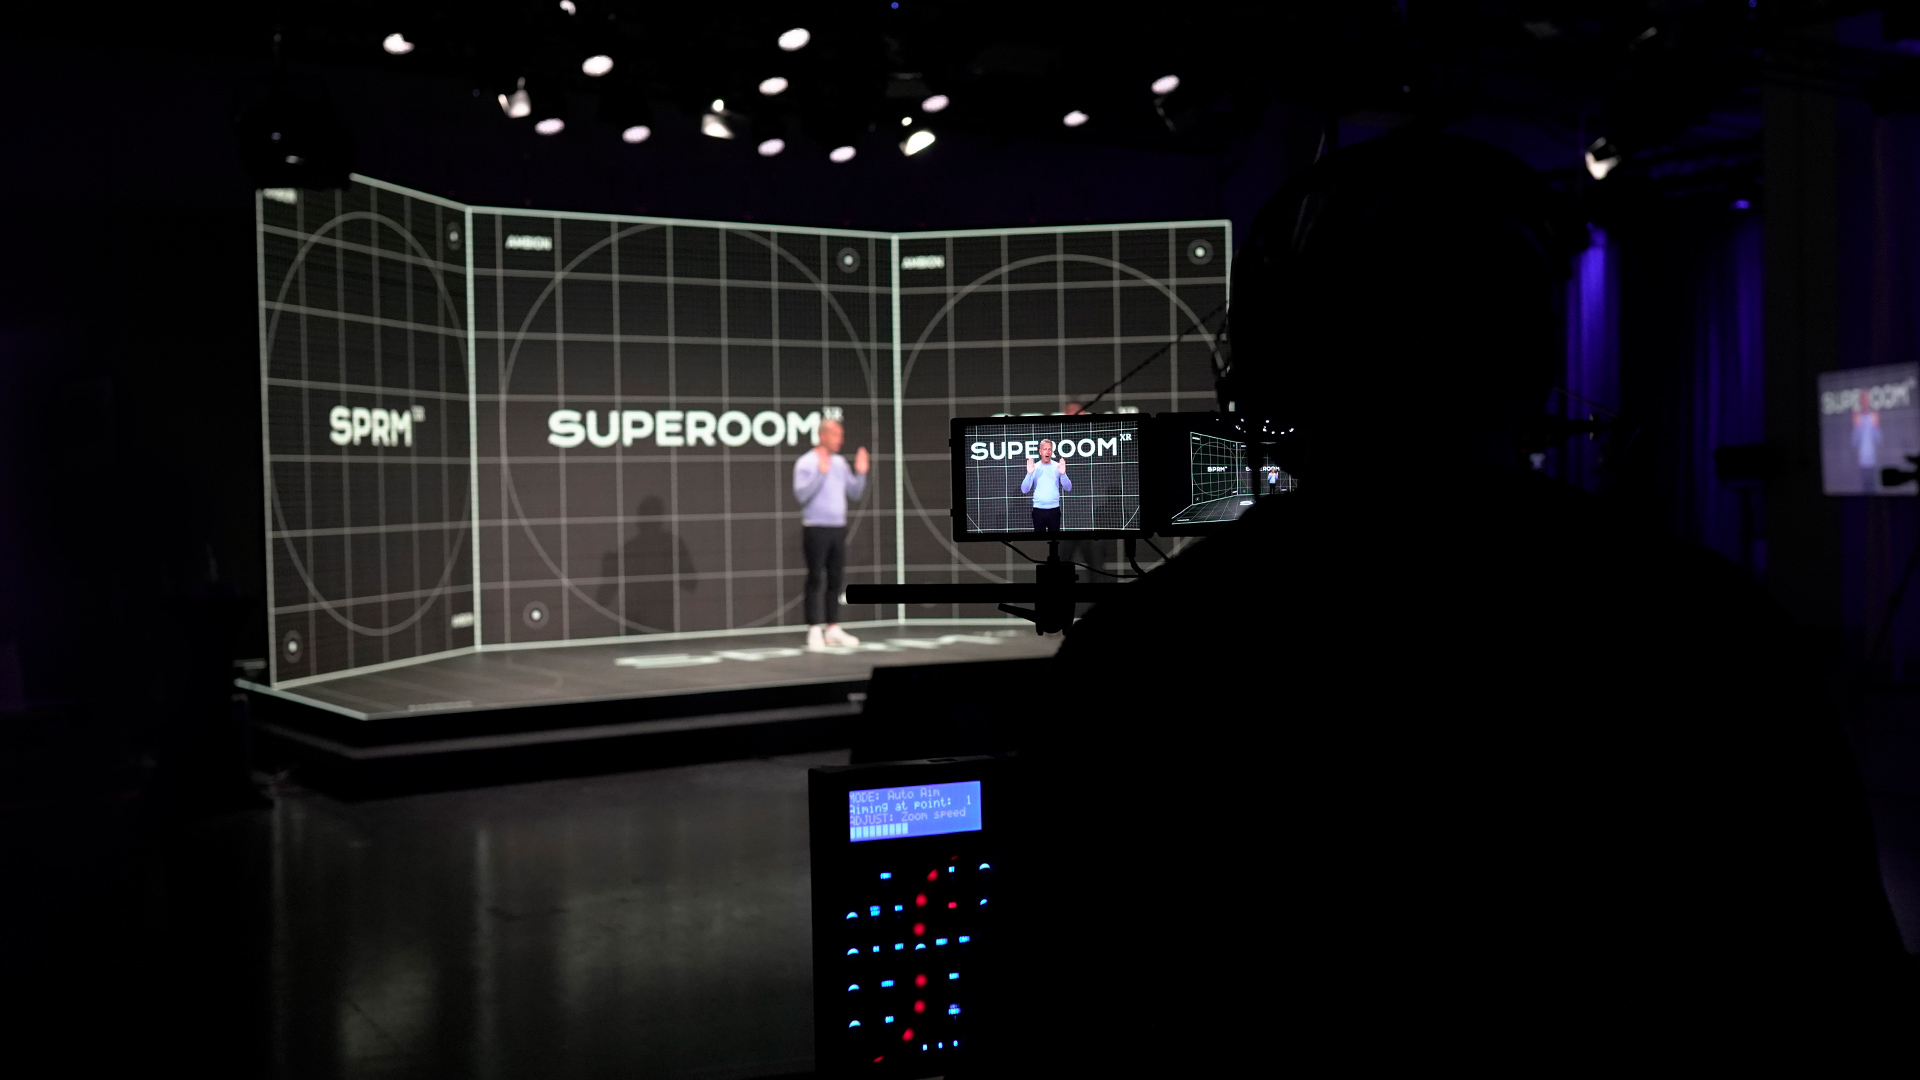 superoom_xr_berlin_ambion_06